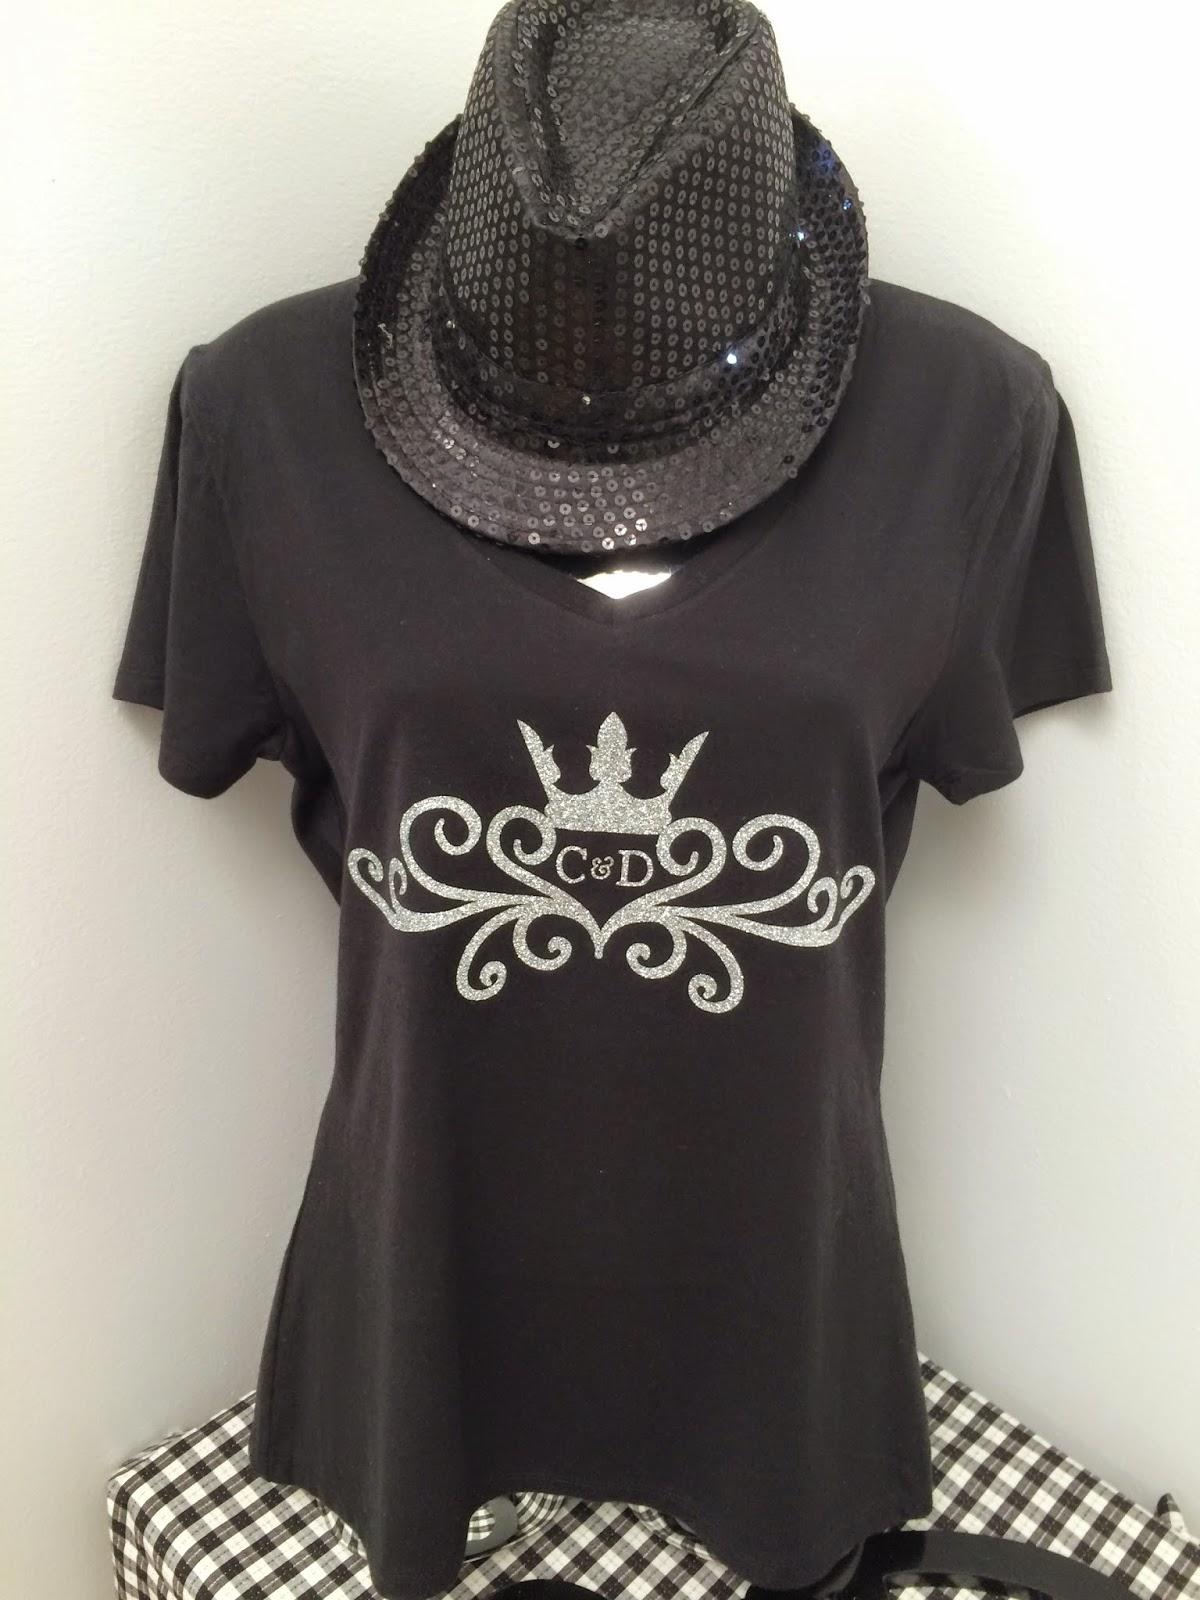 Shirt design jacksonville fl - I Created This Custom Shirt For C D Pageantry Here In Jacksonville Fl